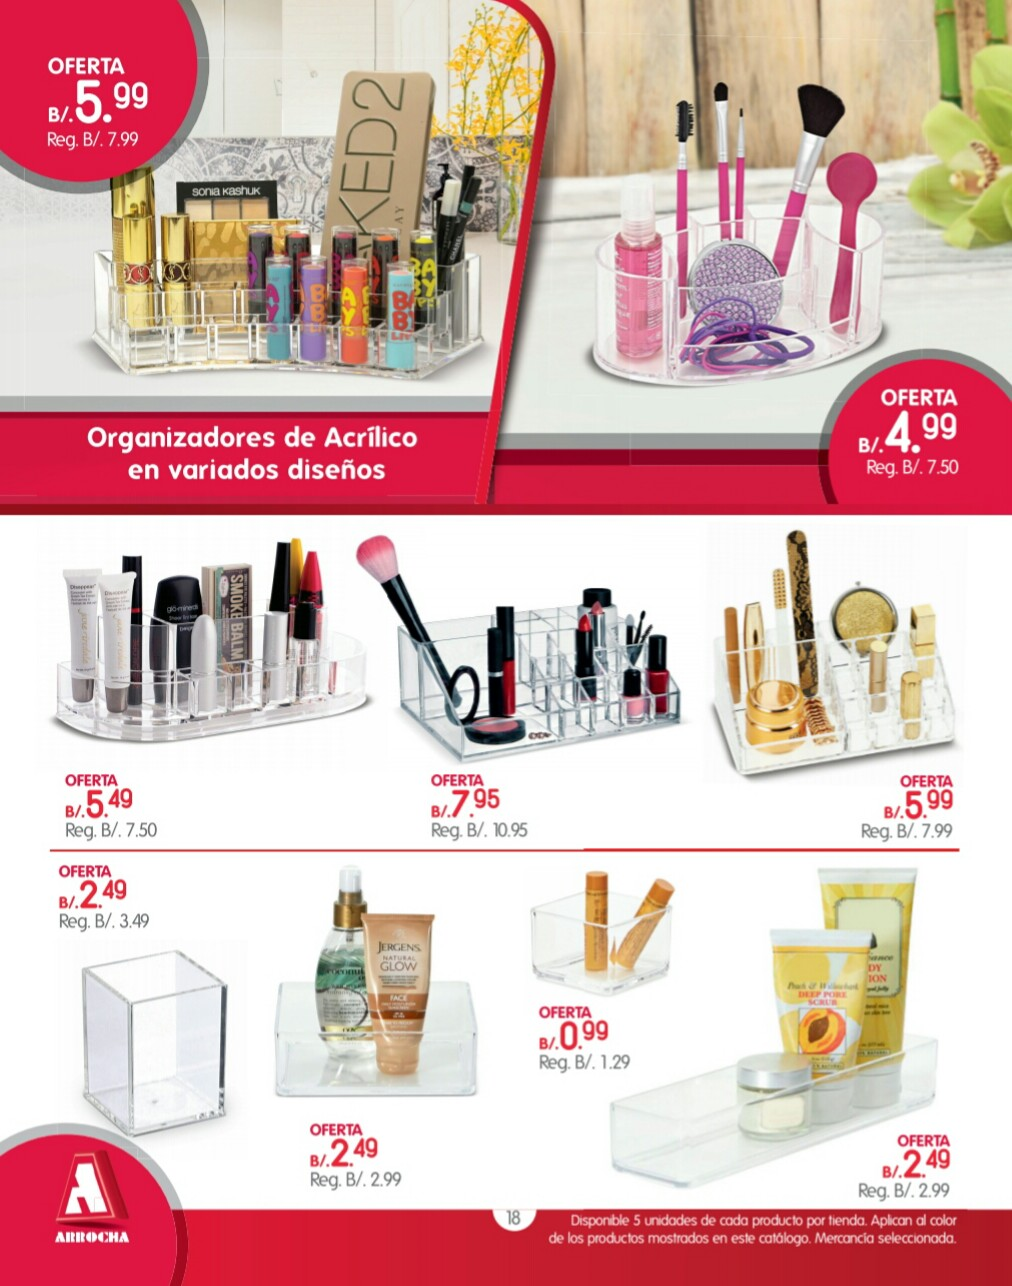 Catalogo de ofertas Arrocha -septiembre 2018 p18